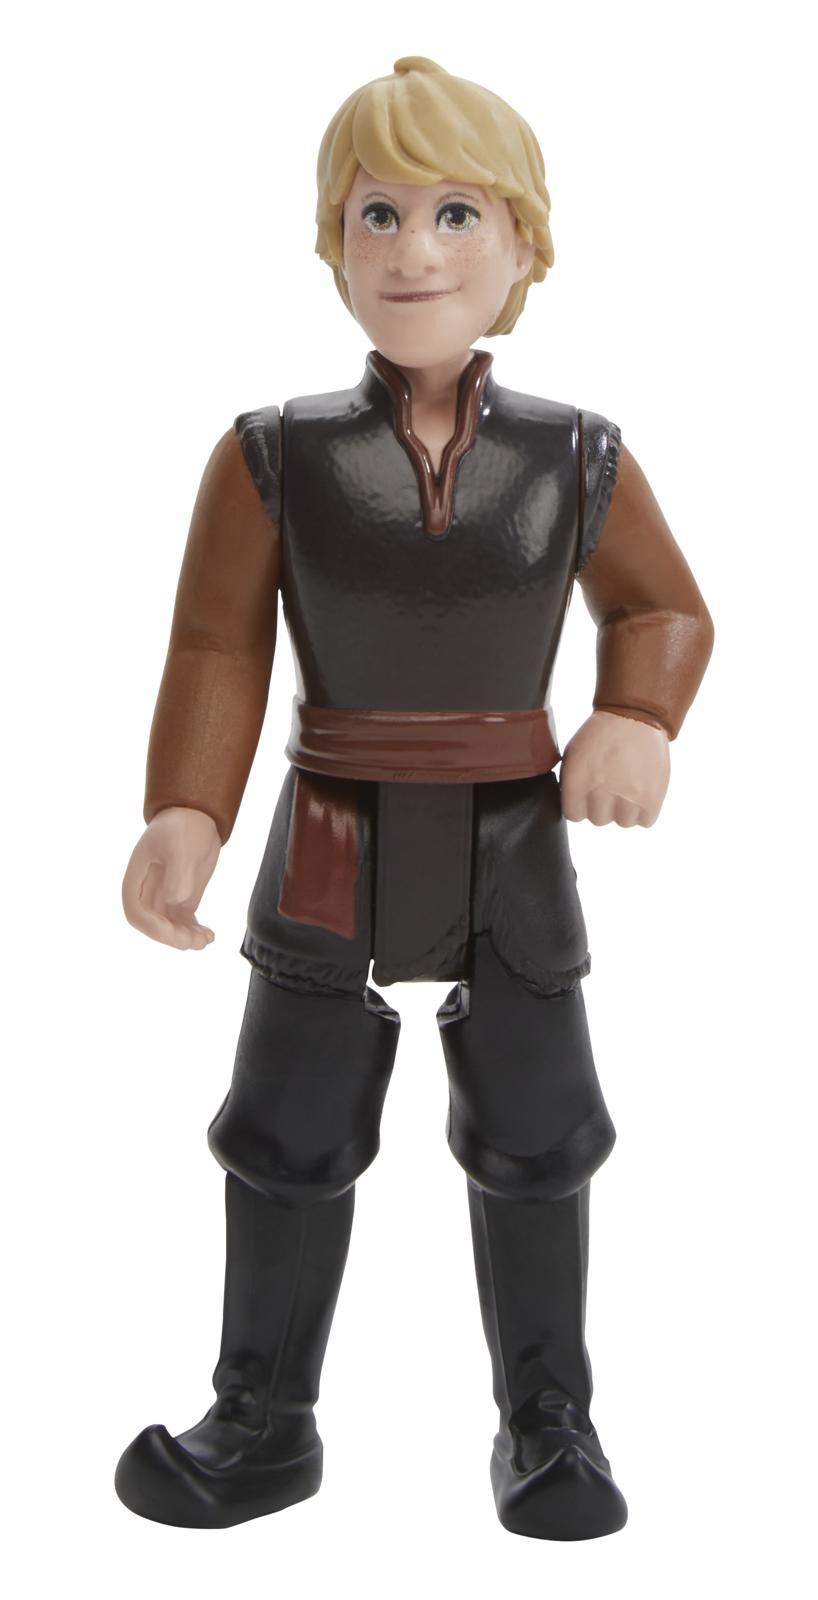 Frozen II: Kristoff - Small Doll image